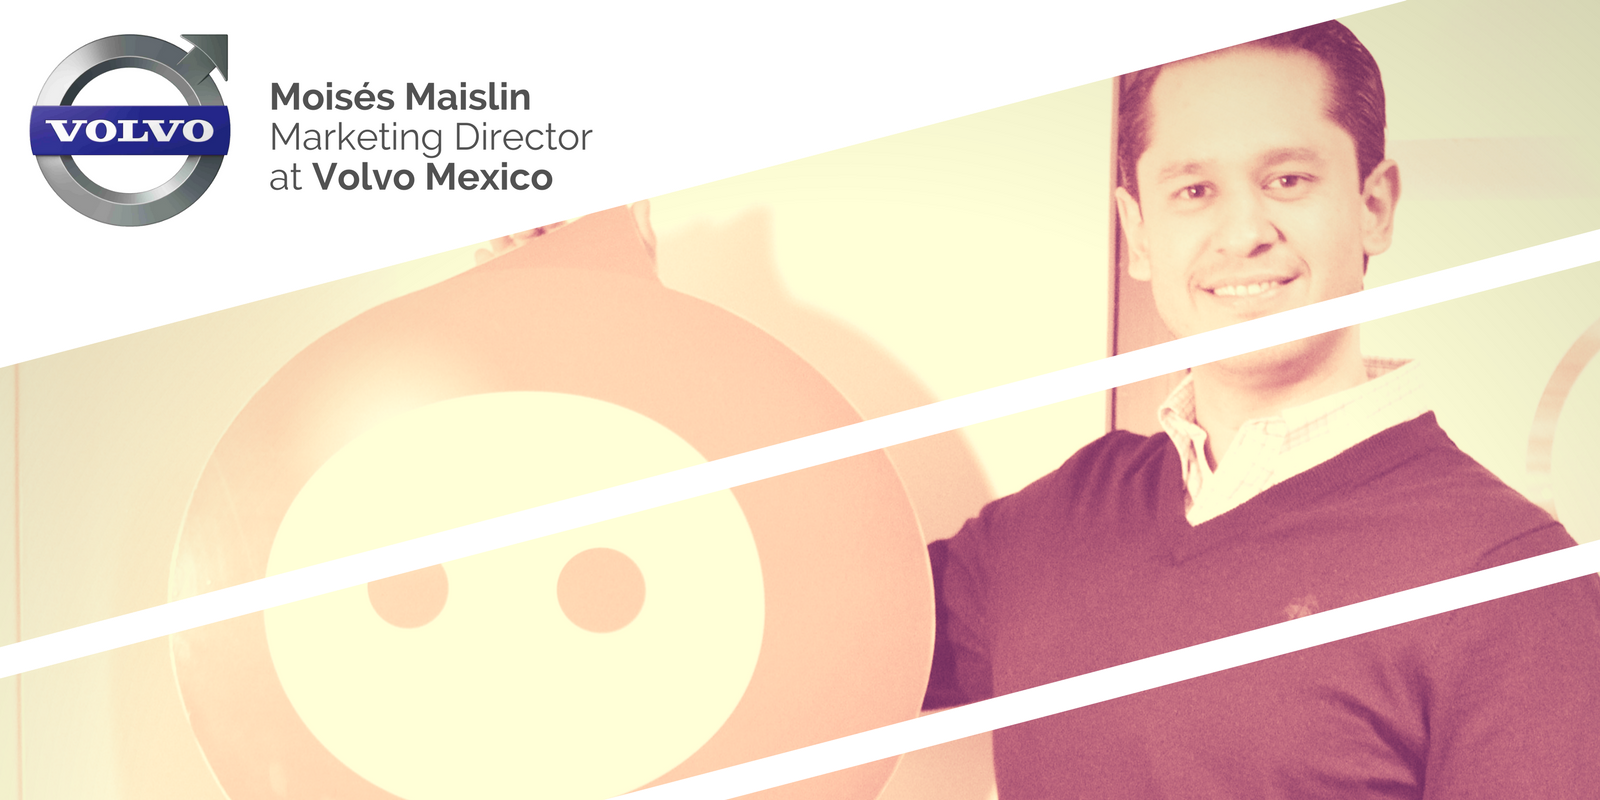 Moisés Maislin Marketing Director at Volvo Mexico Entrevista Elogia foto principal.png